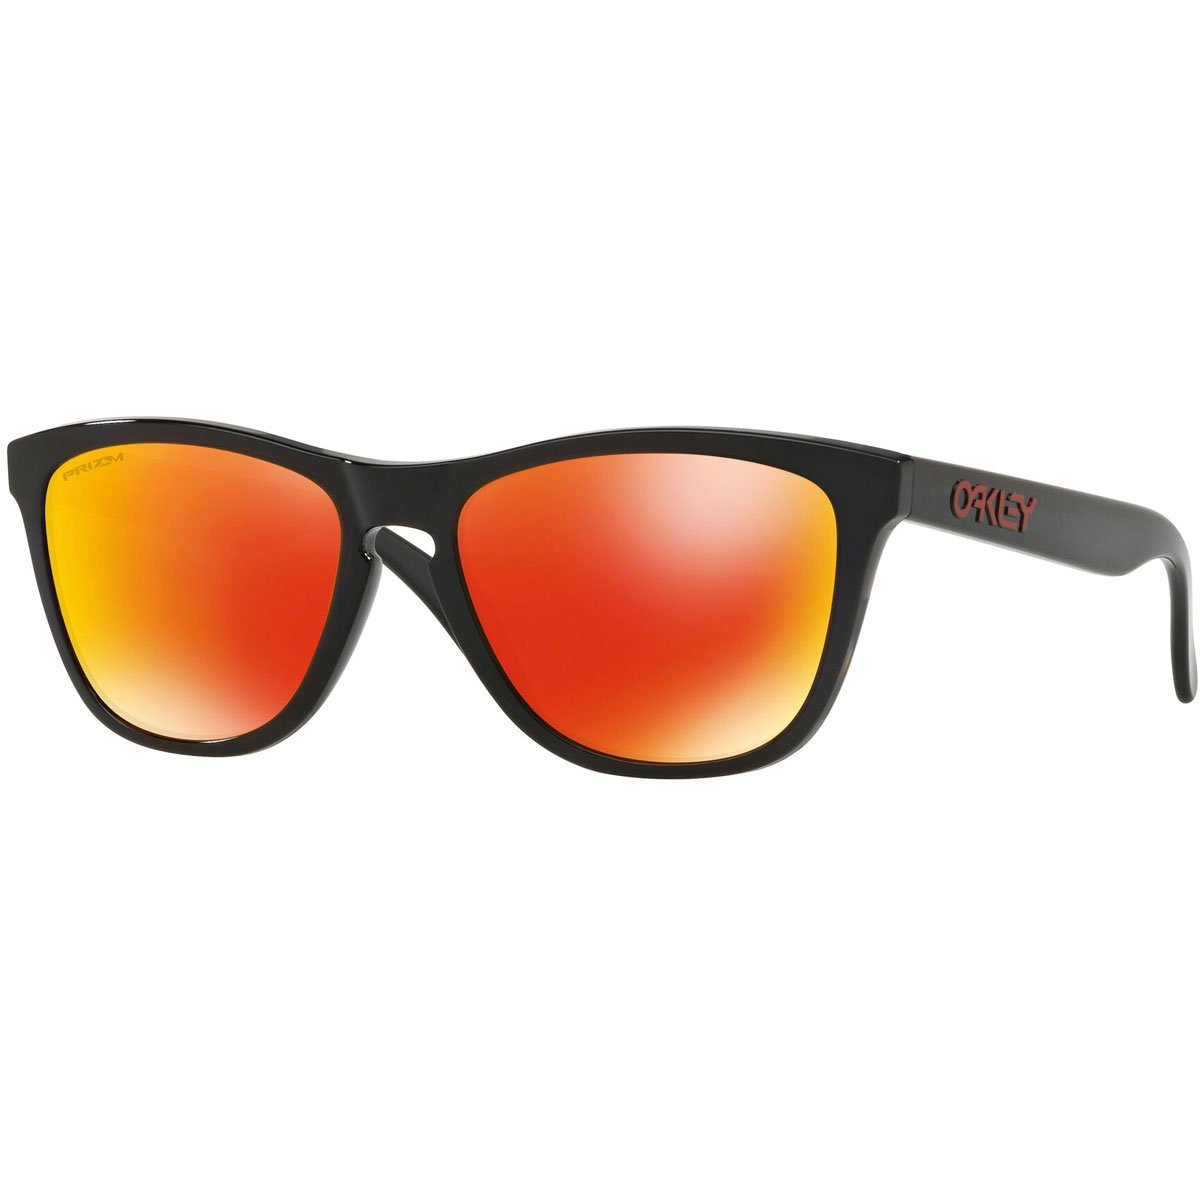 4fd616235c3b Amazon.com: Oakley Men's Frogskins Non-Polarized Iridium Square Sunglasses,  BLACK INK, 54.7 mm: Clothing